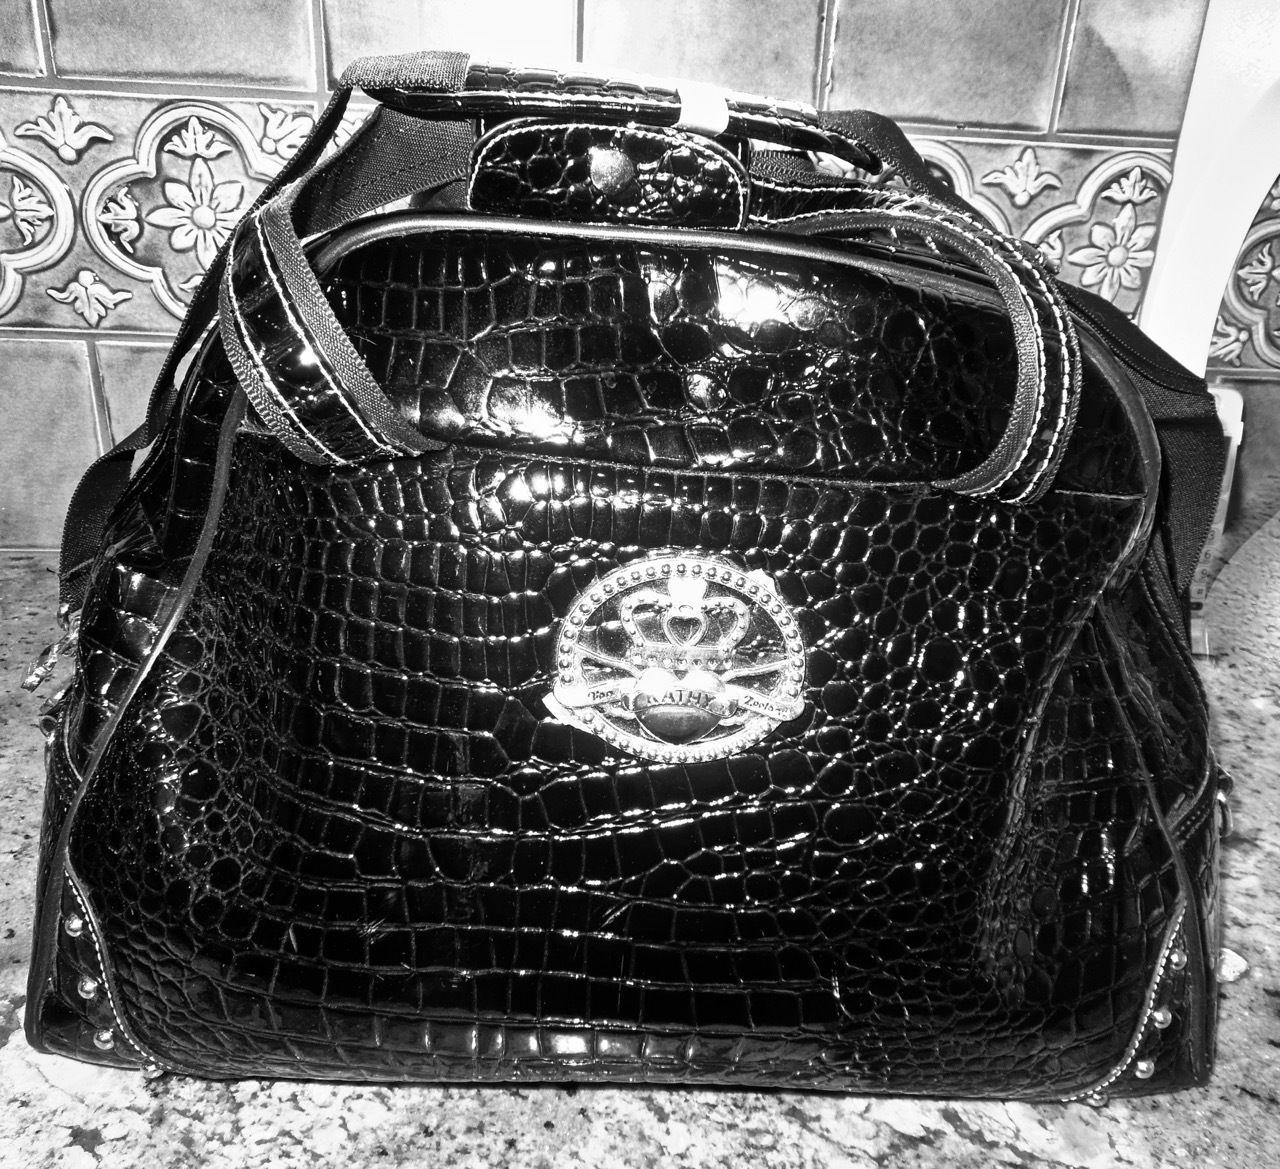 f43e69e675 Kathy Van Zeeland Black Faux Croc Patent and 22 similar items. 57